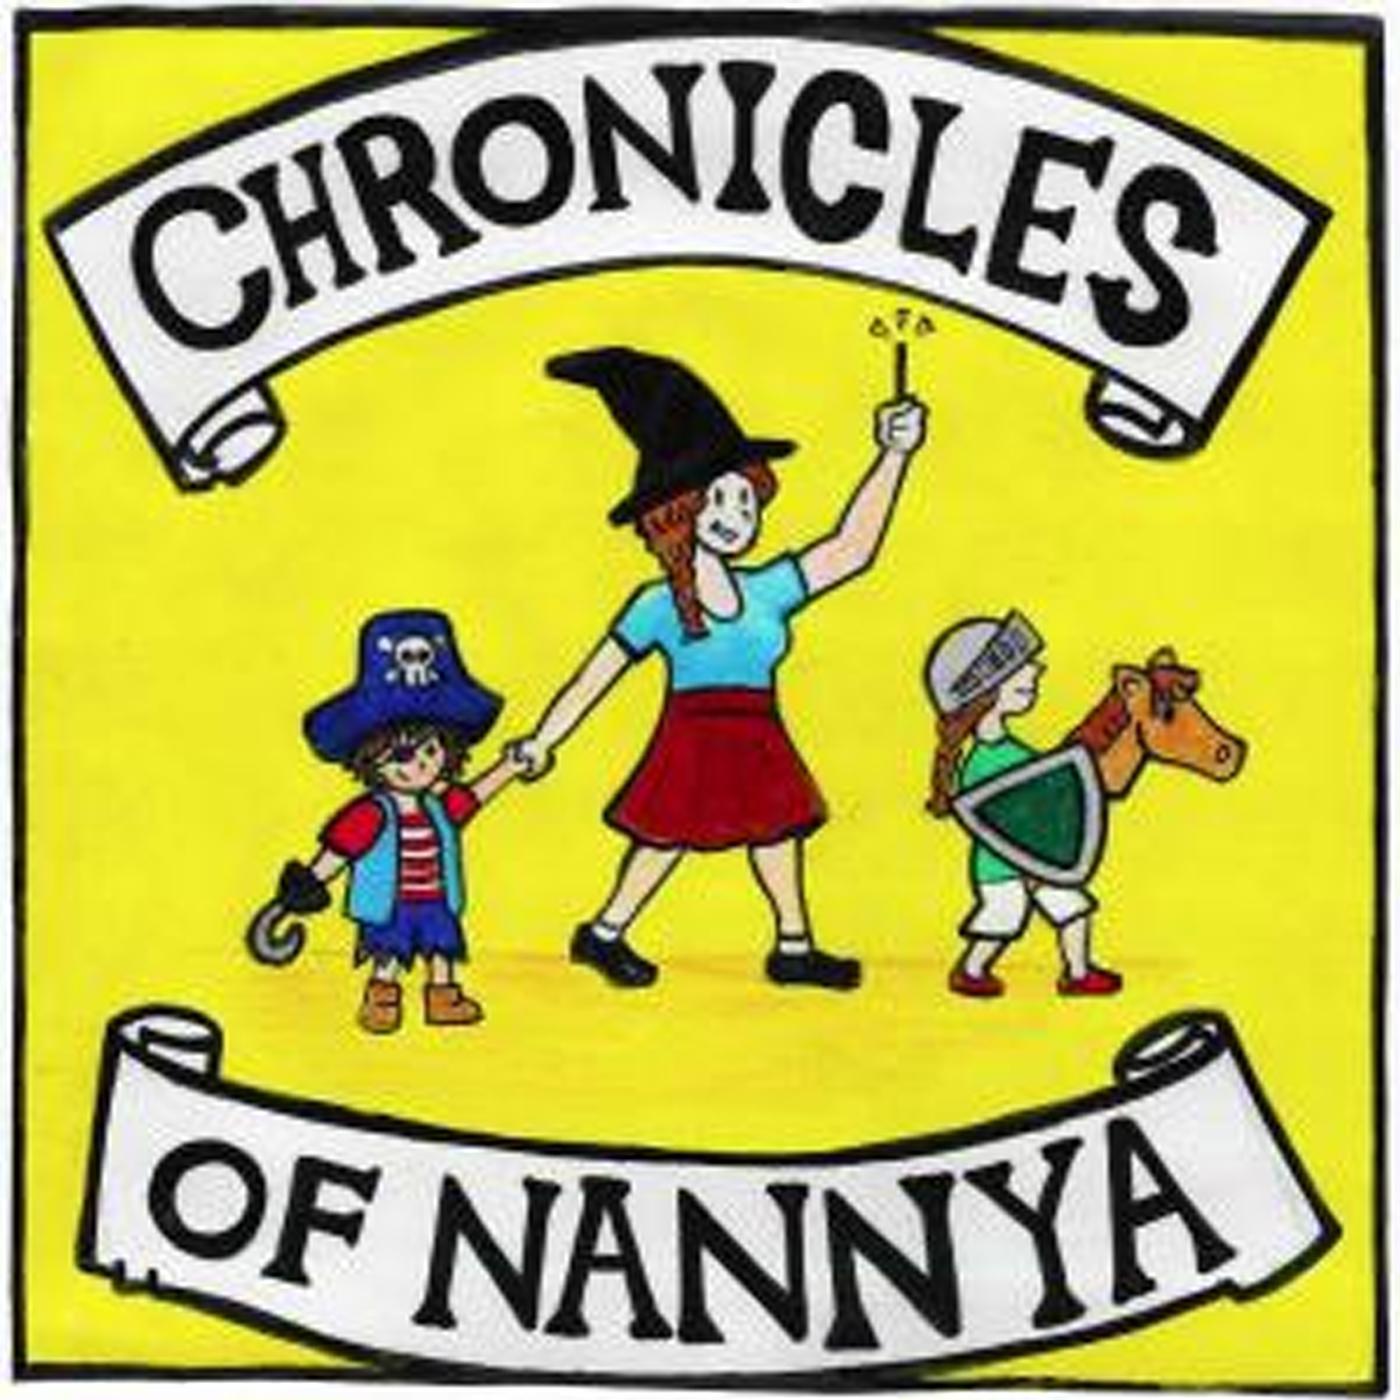 Chronicles of Nannya Cover Art.png